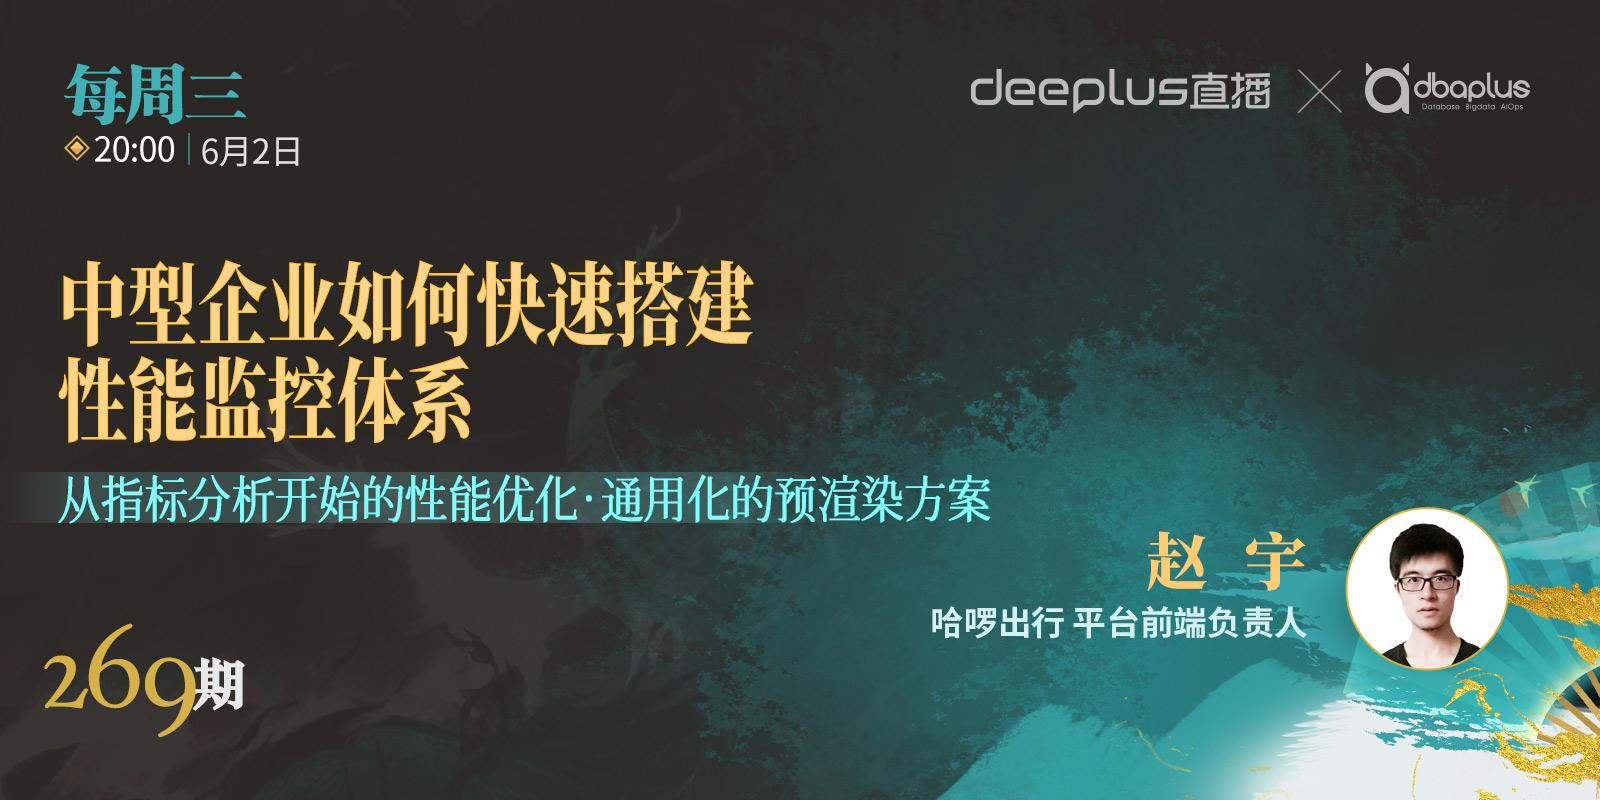 【dbaplus社群线上分享269期】中型企业如何快速搭建性能监控体系